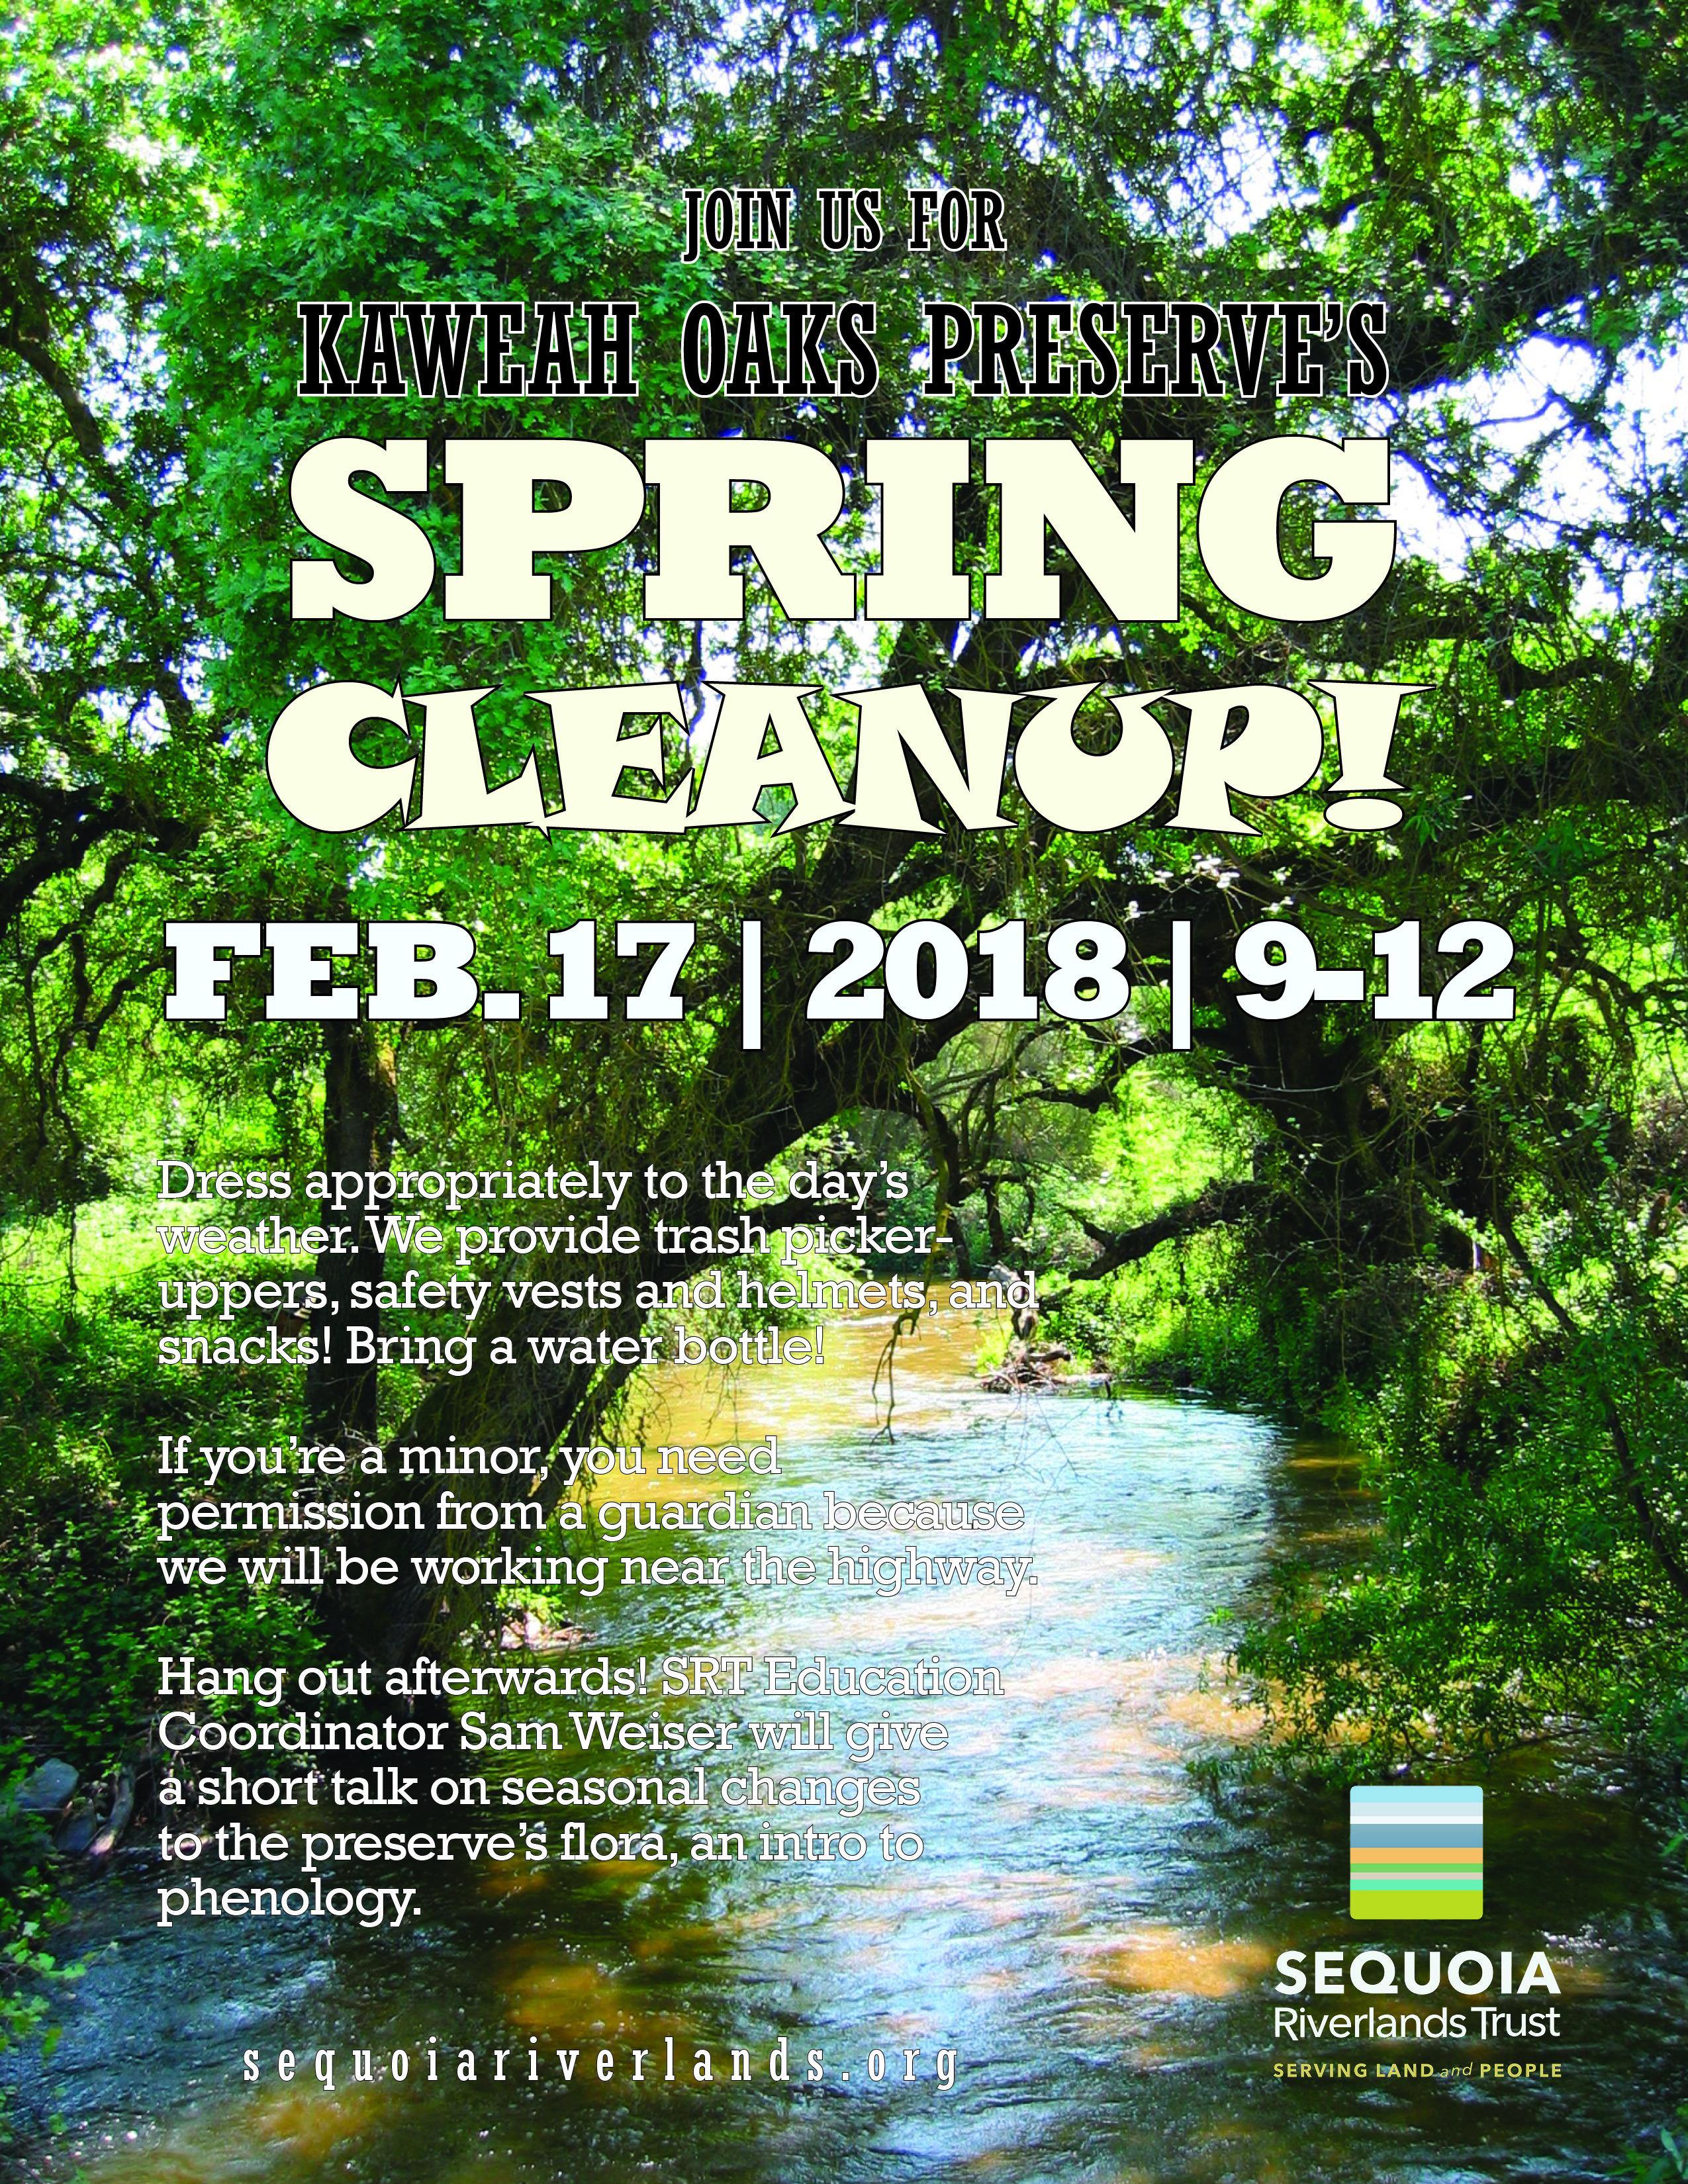 Let's Spruce Up Kaweah Oaks Preserve!